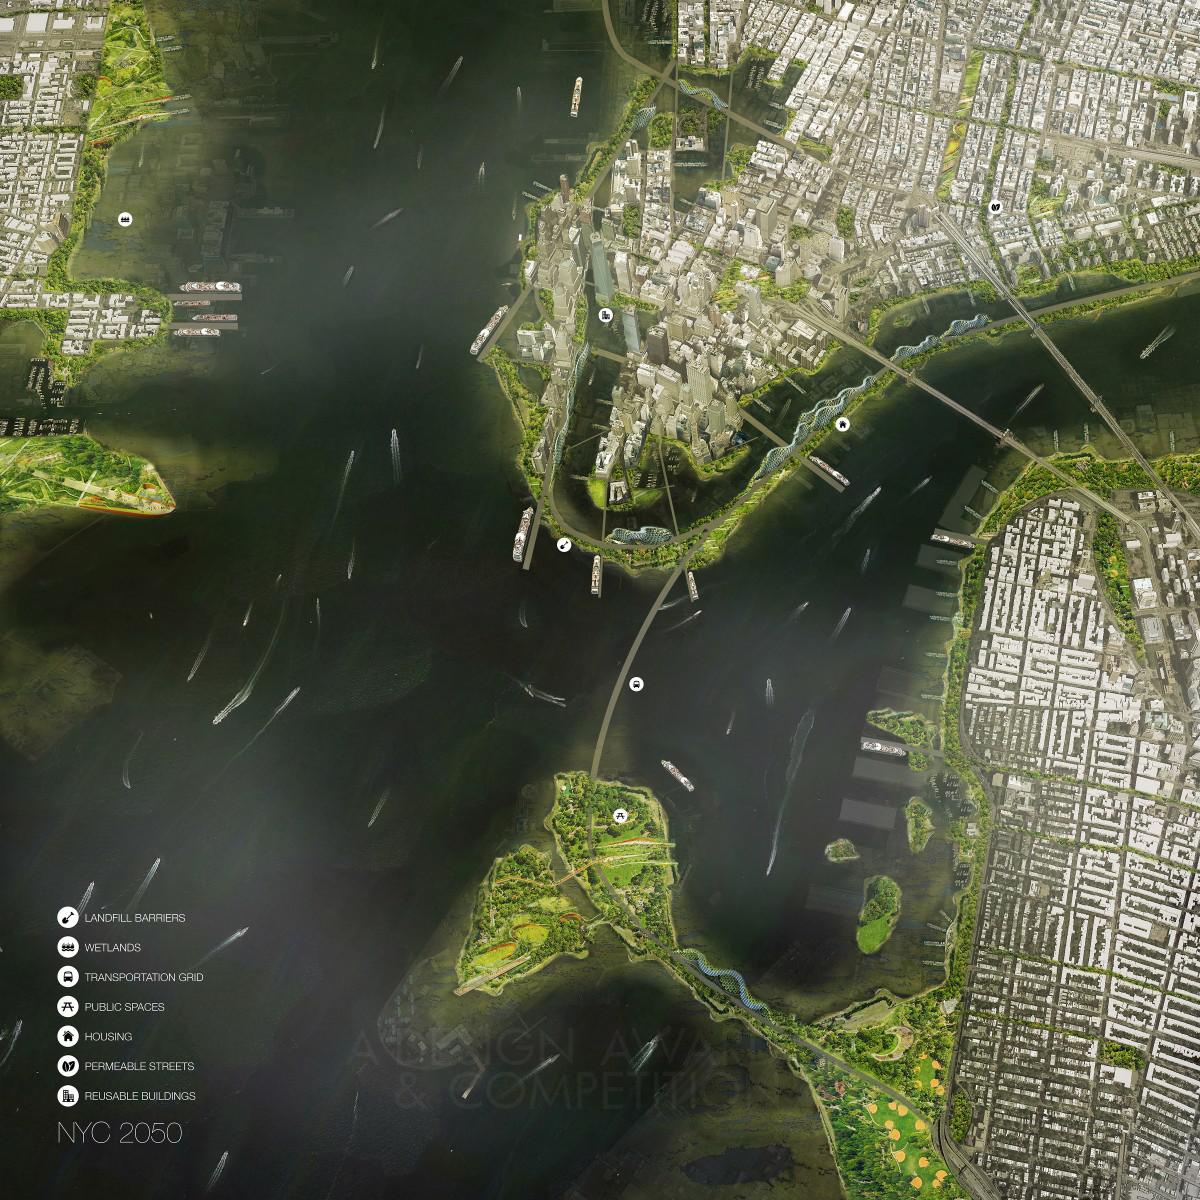 NYC 2050 City Masterplan